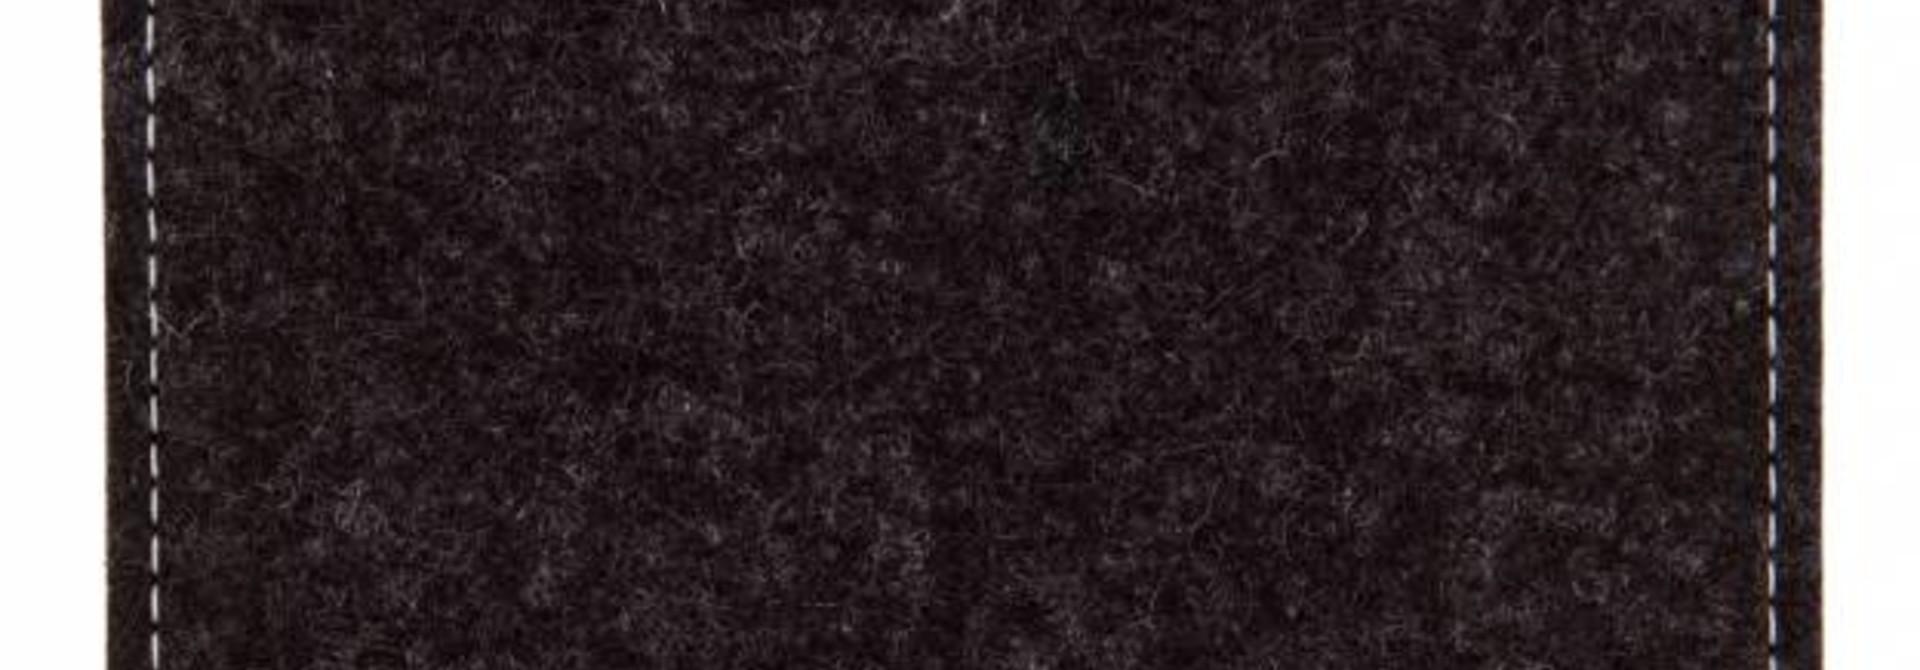 Kindle Sleeve Anthracite